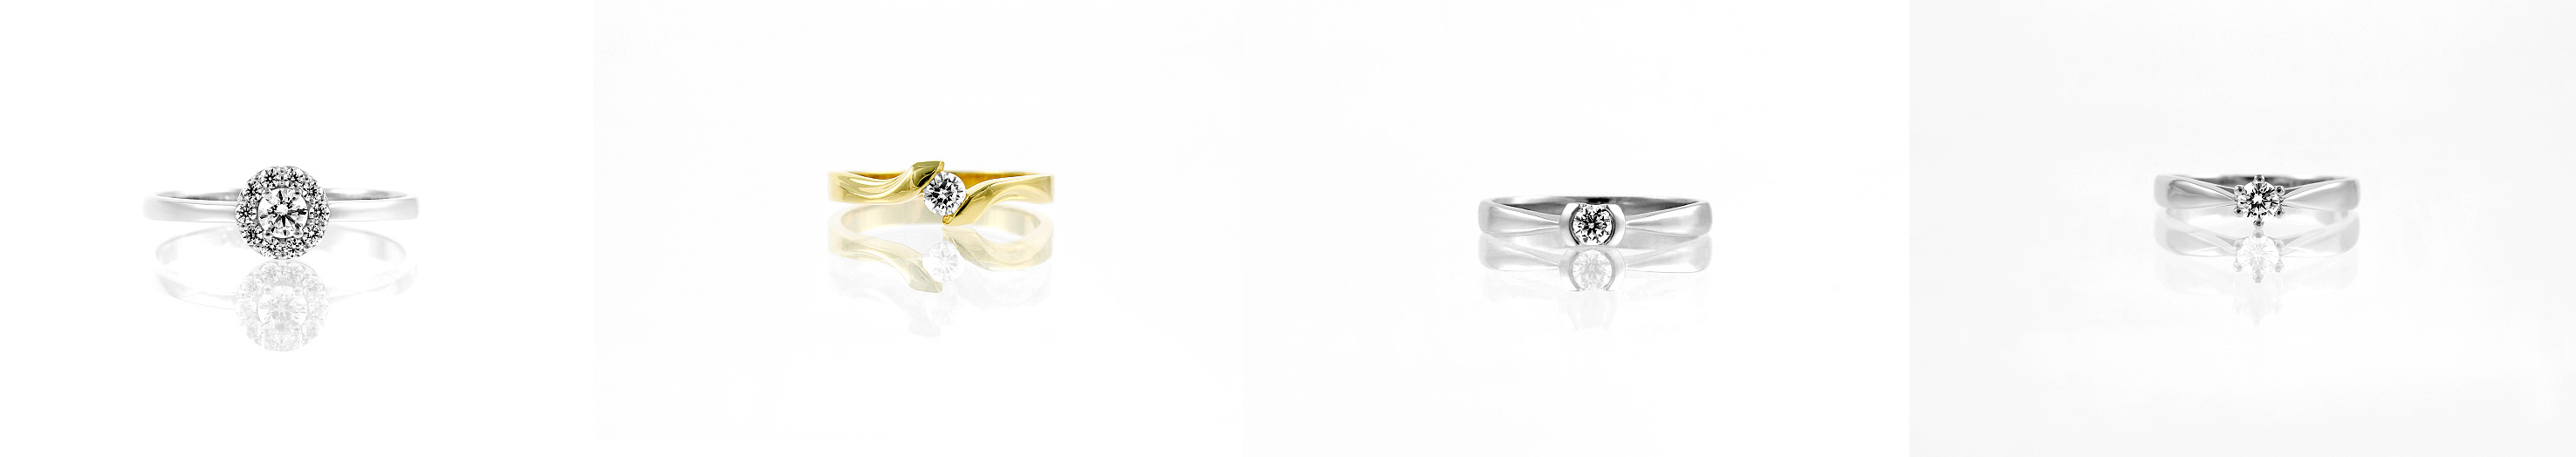 Svatebni Sezona Se Blizi Jak Vybrat Ten Pravy Zasnubni Prsten